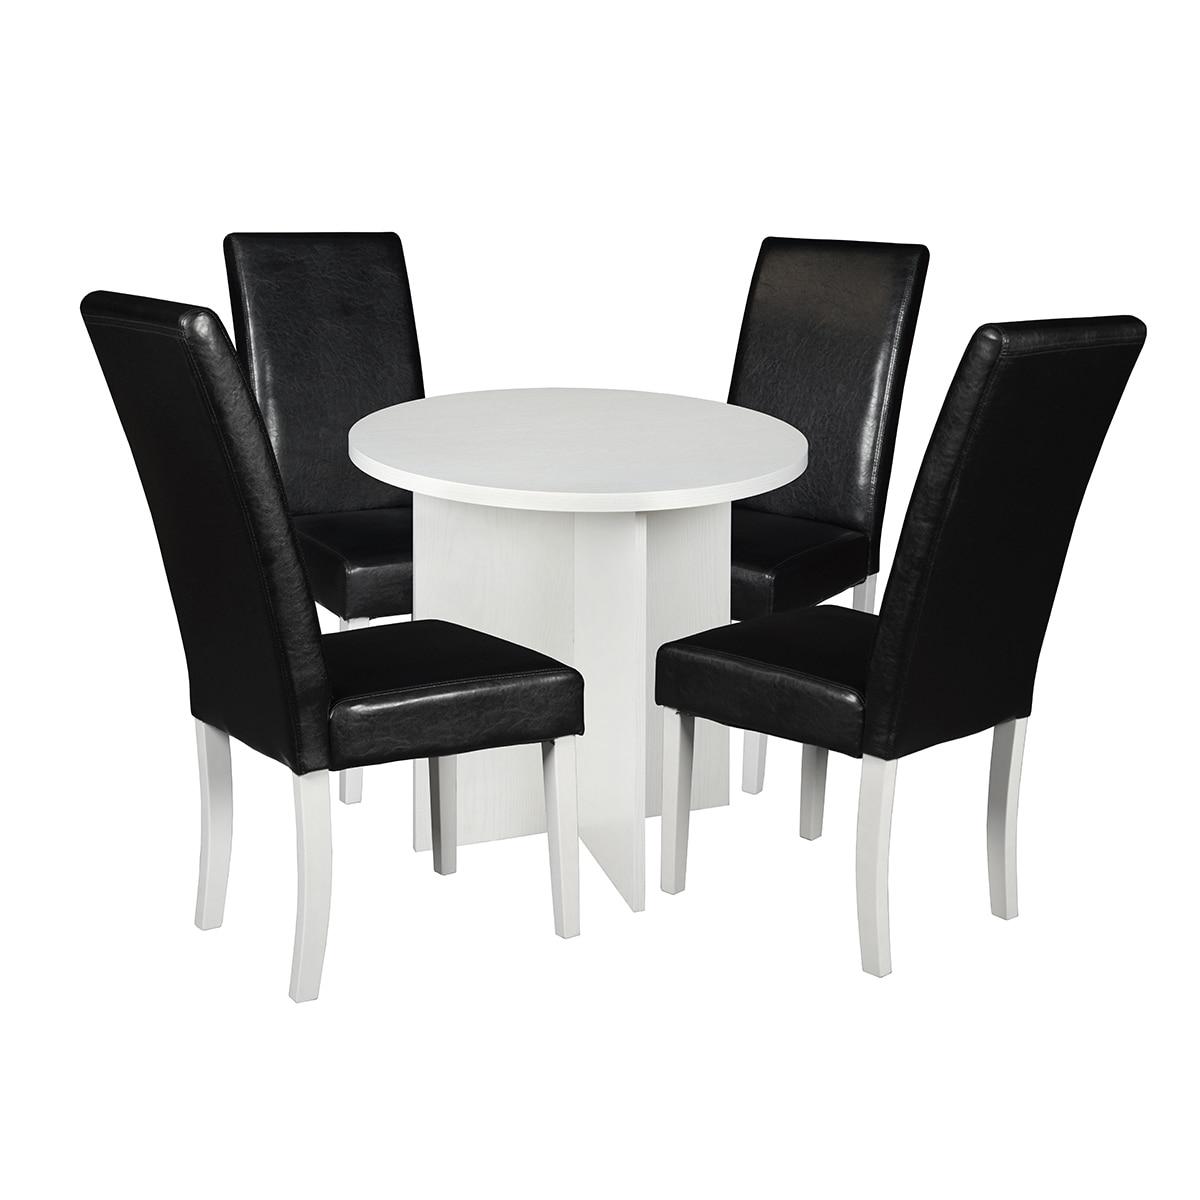 "Regency Seating Niche Mod 30"" Round Table & 4 Tyler Dinin..."